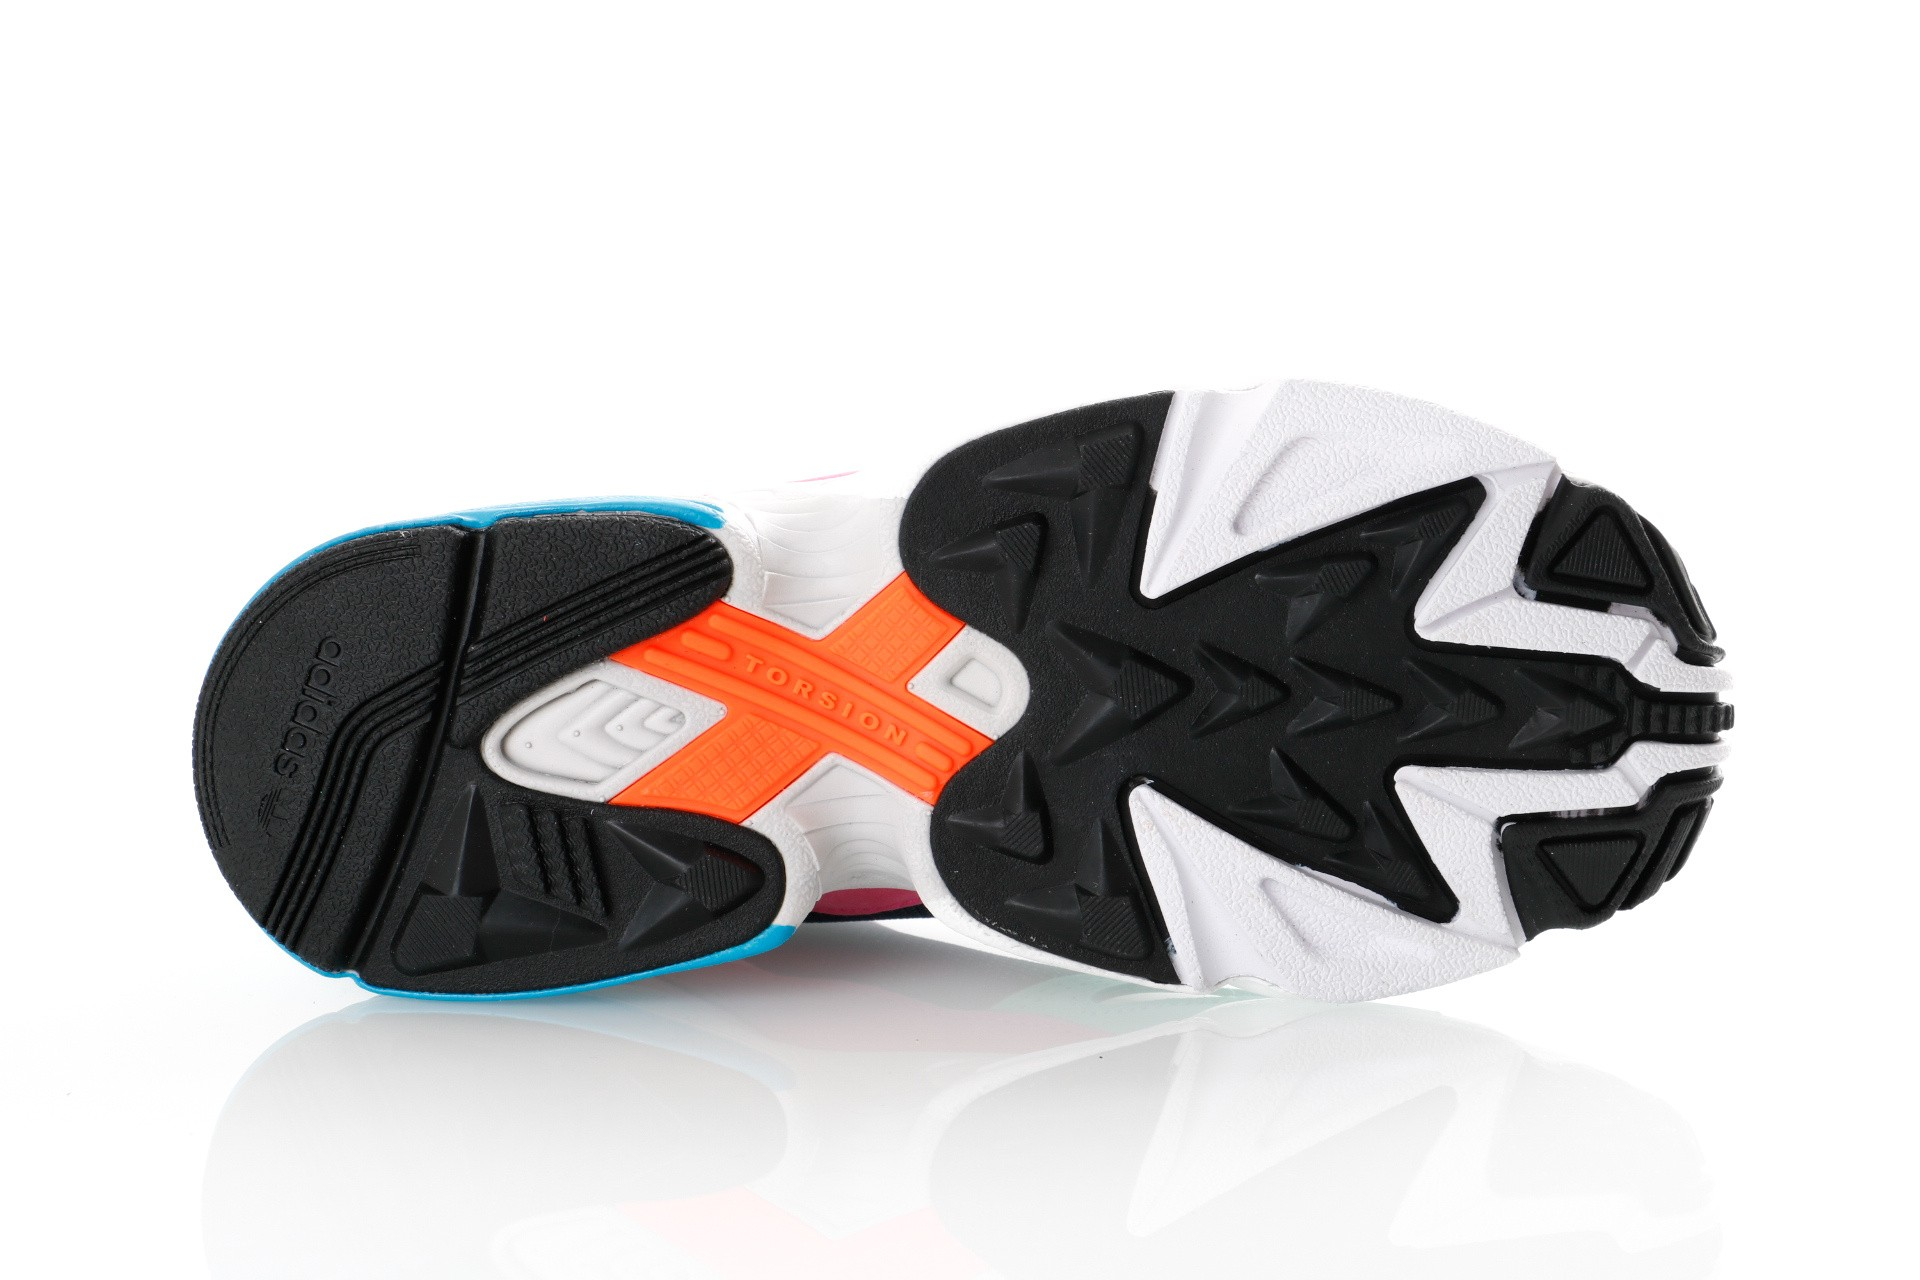 c446f1bd66b6 Afbeelding van Adidas Falcon W Cg6211 Sneakers Collegiate Navy Collegiate  Navy Hi-Res